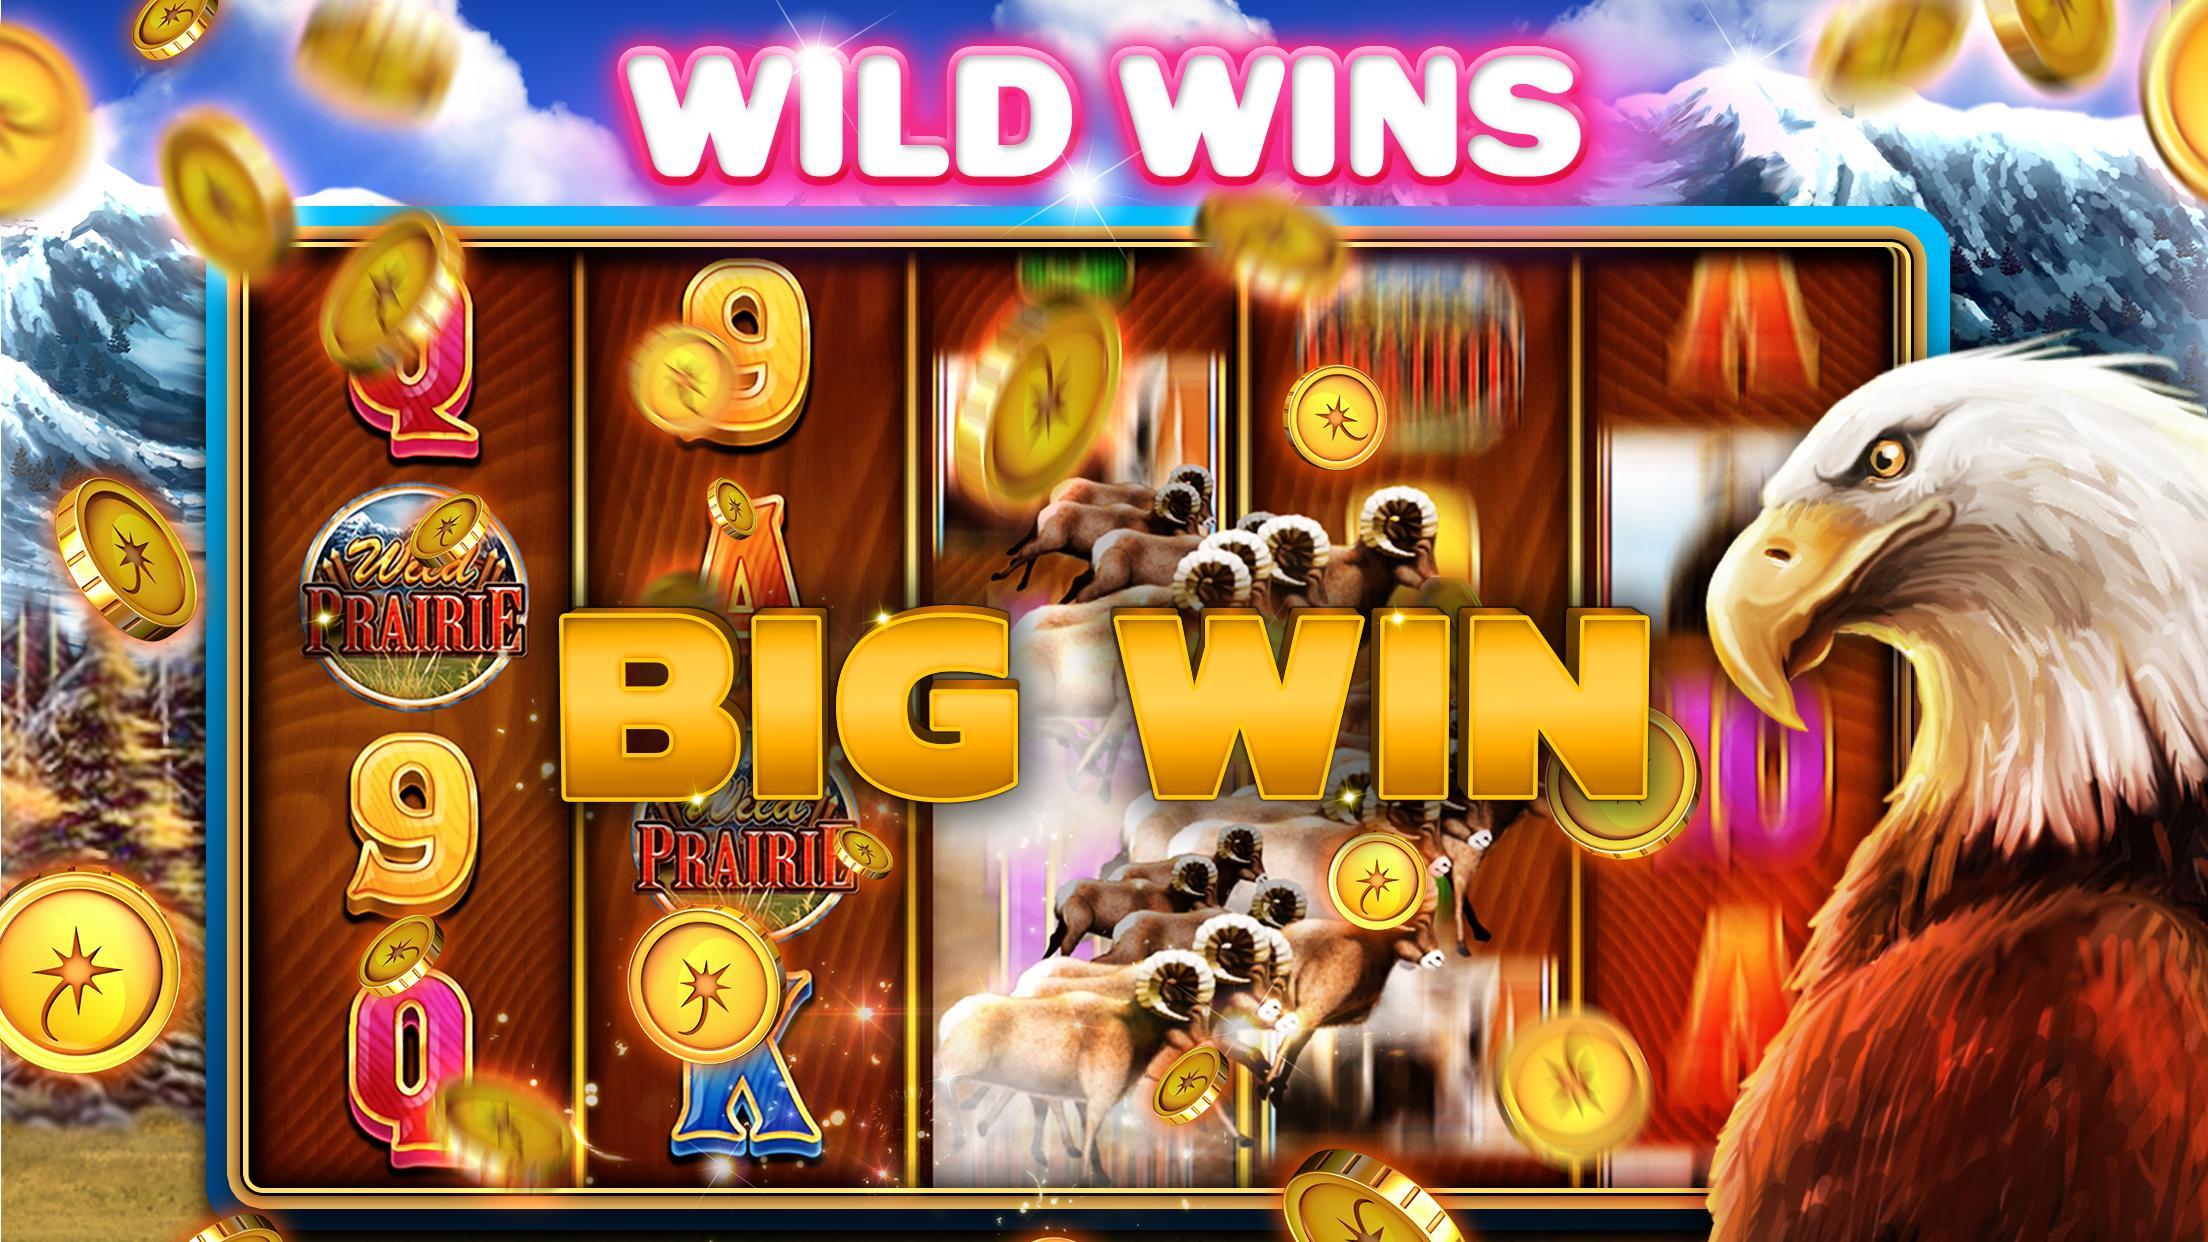 Jackpotjoy Slots Slot machines with Bonus Games 26.0.05 Screenshot 12